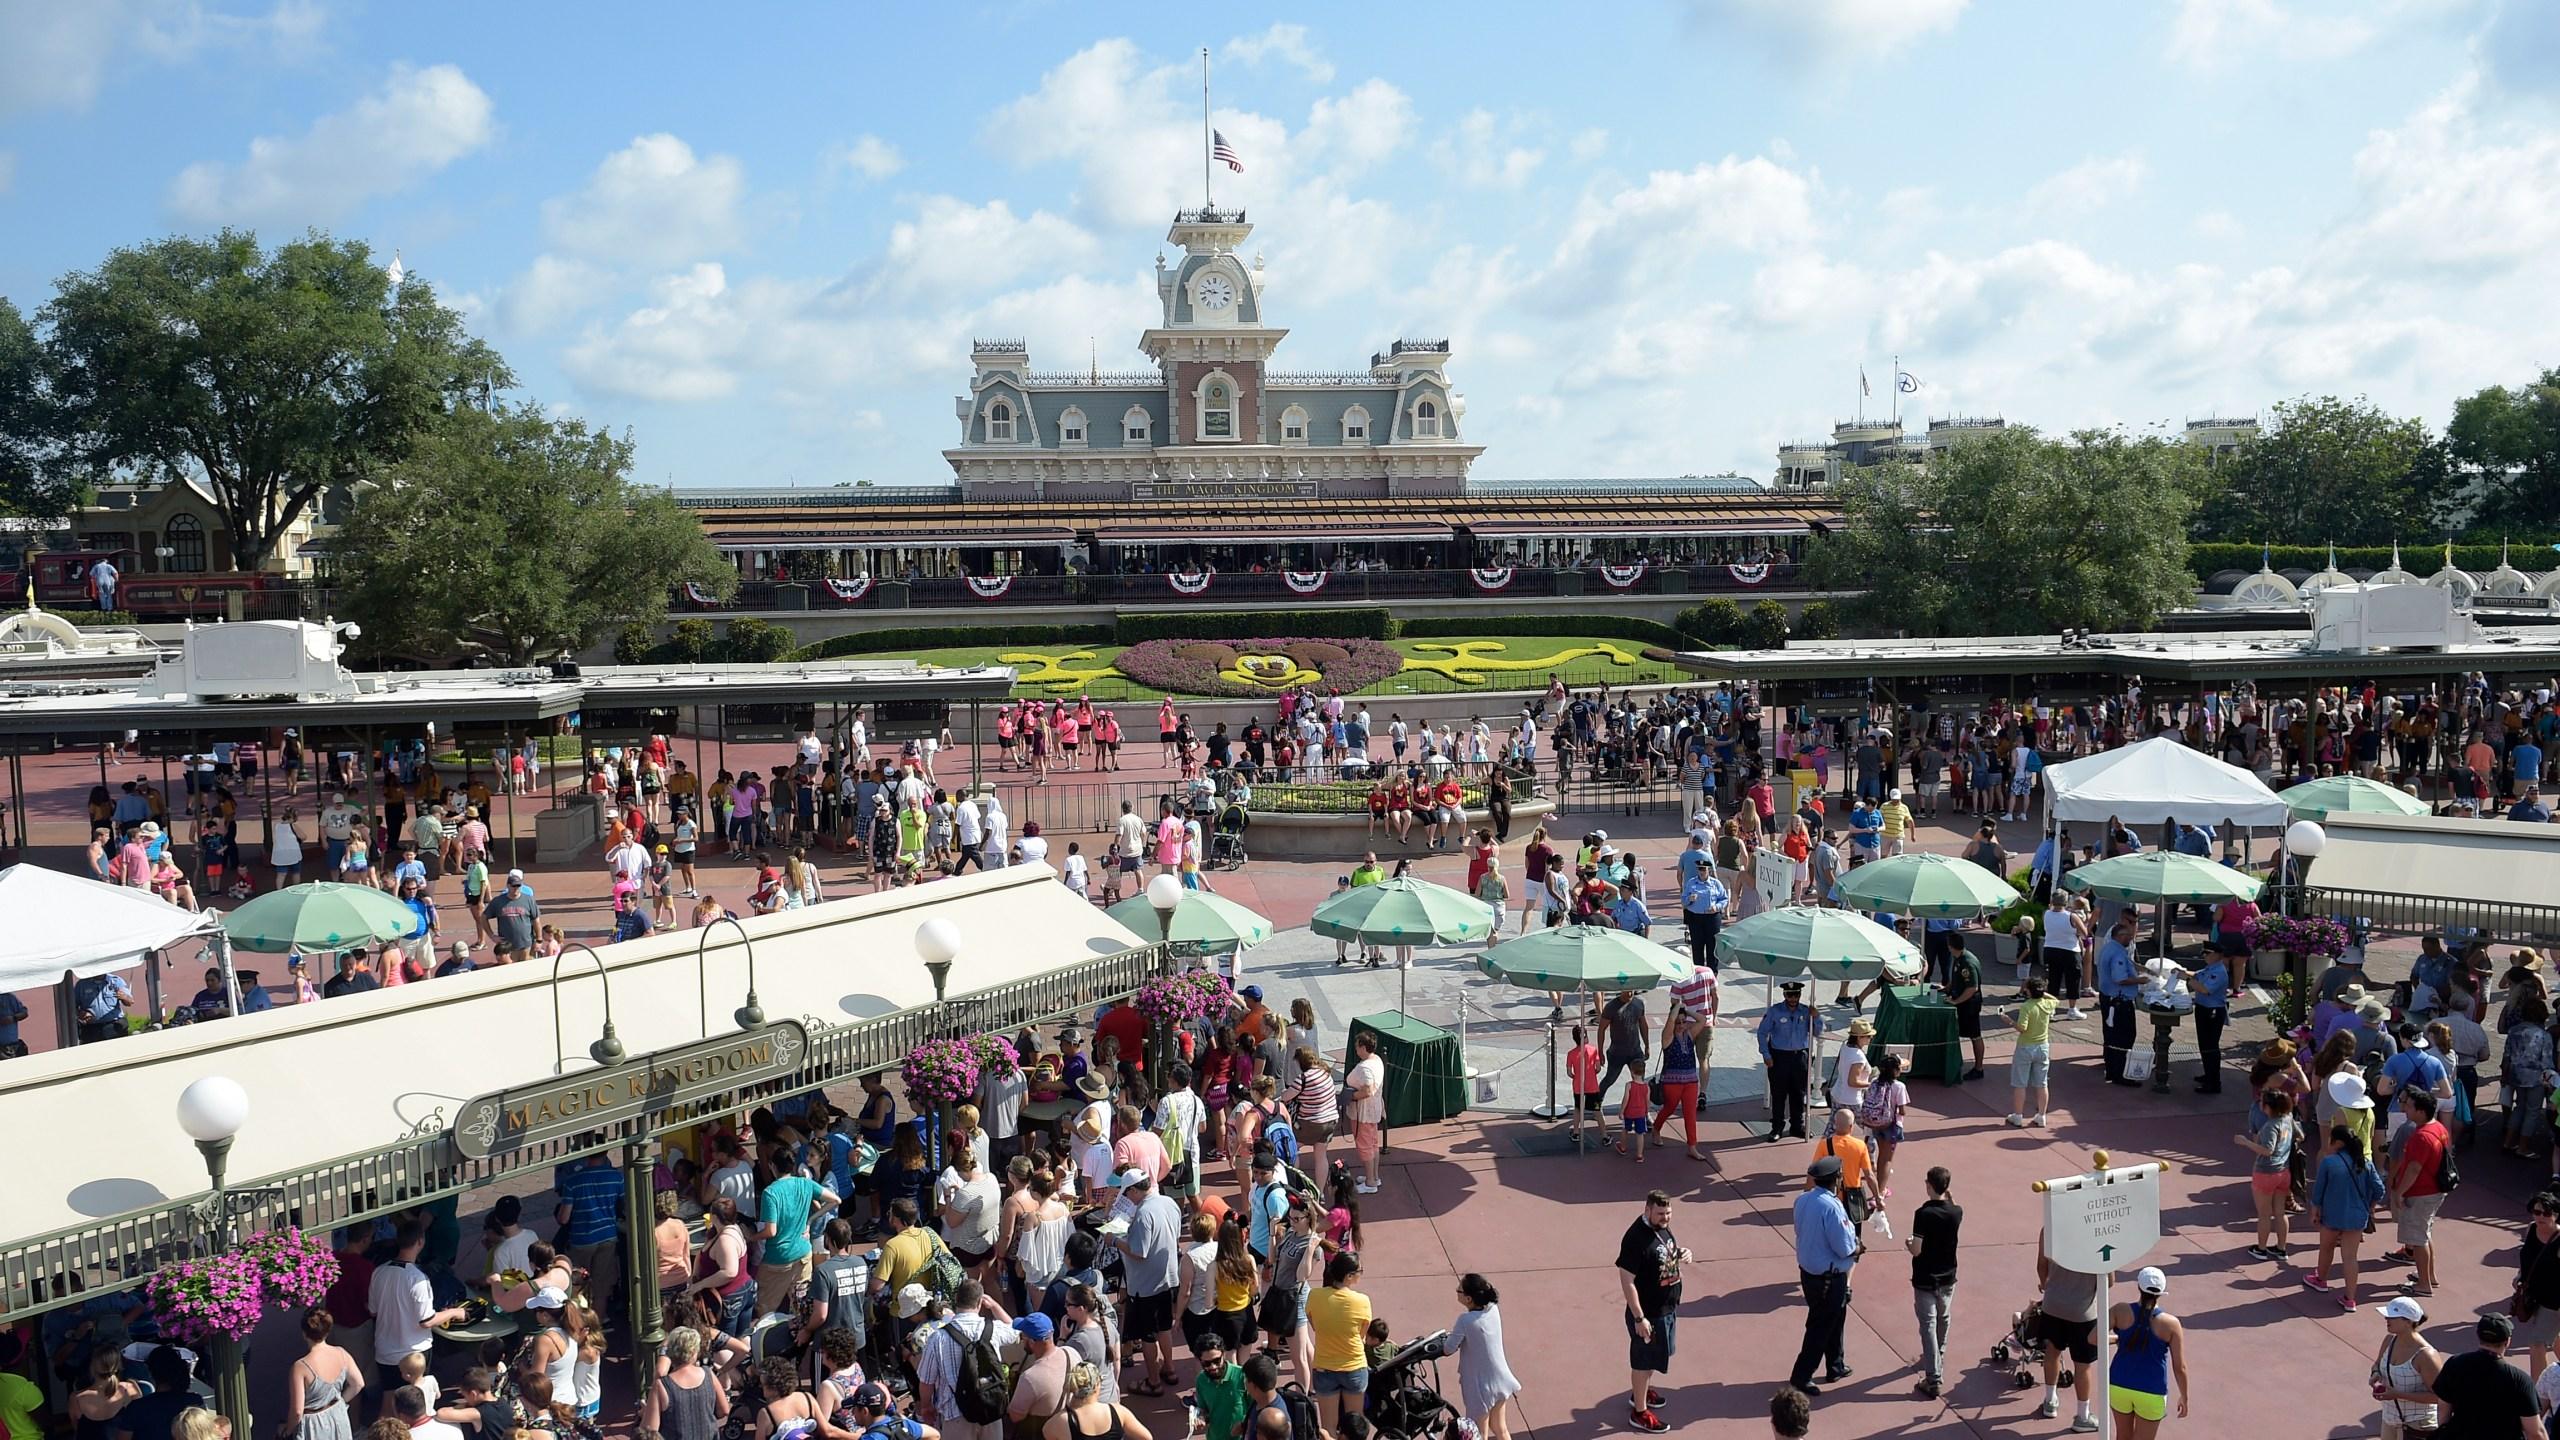 Disney_Tuition_44180-159532.jpg61491765